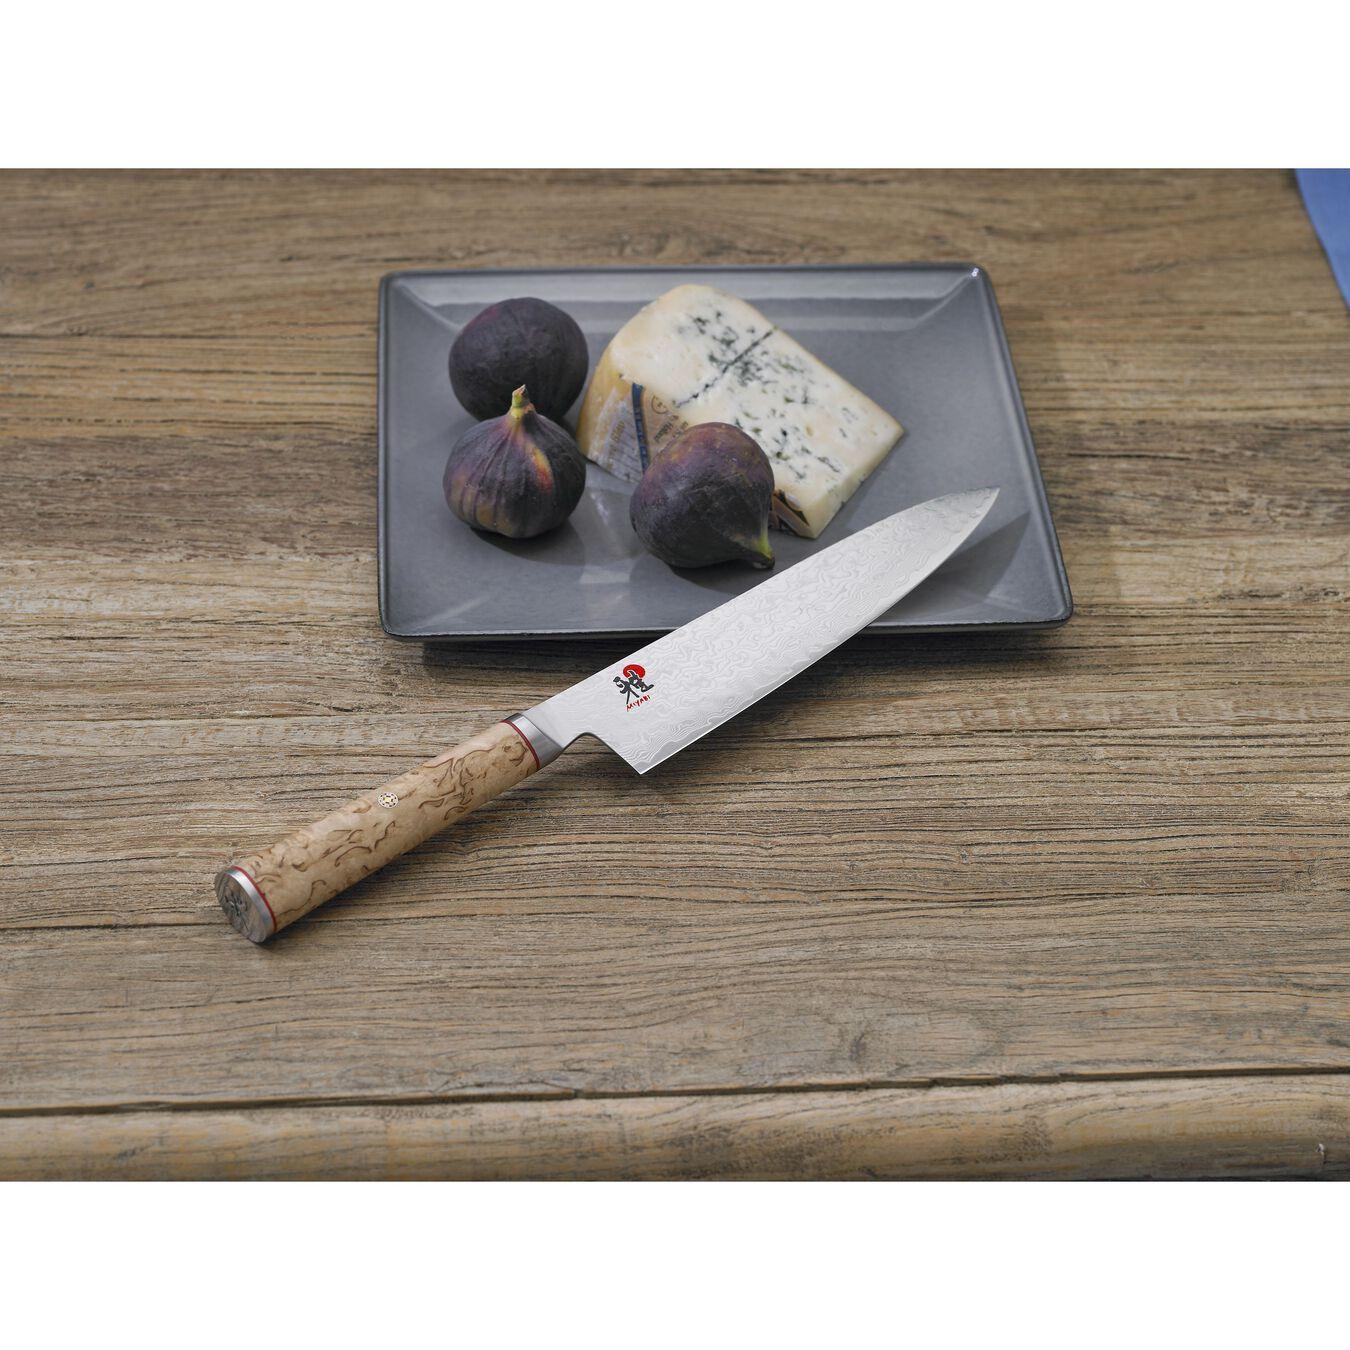 2 Piece Knife set,,large 5